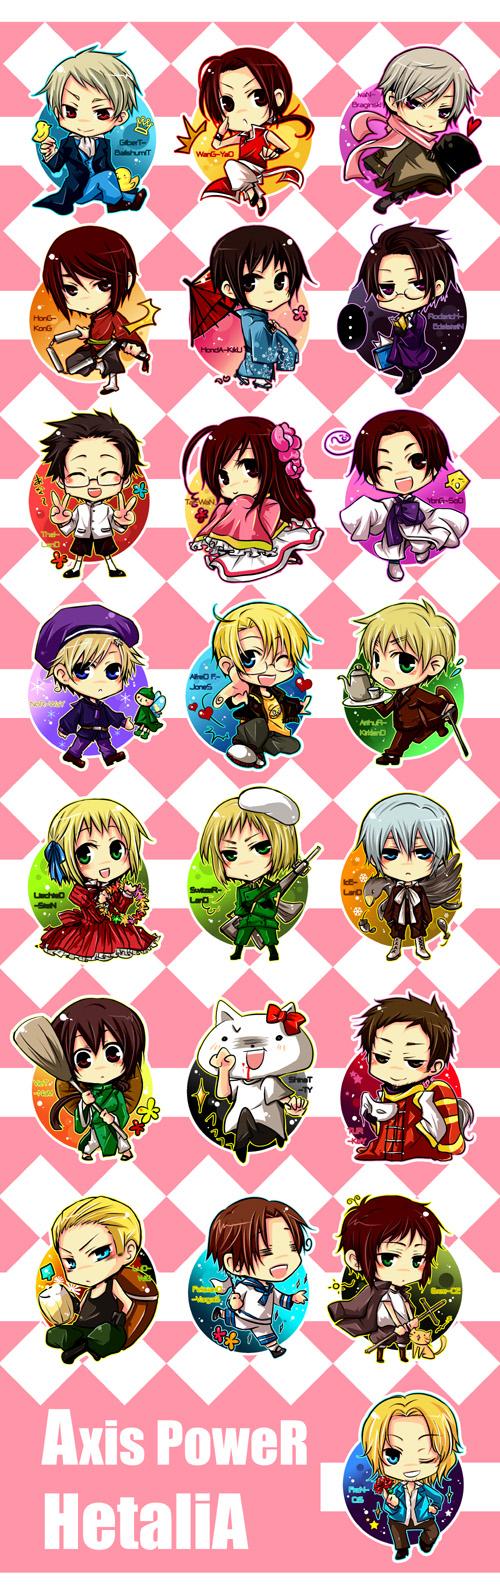 Tags: Anime, Kao (choco*icz), Axis Powers: Hetalia, Liechtenstein, United States, Shinatty-chan, China, Turkey, Japan, Germany, Thailand, Hong Kong, Vietnam